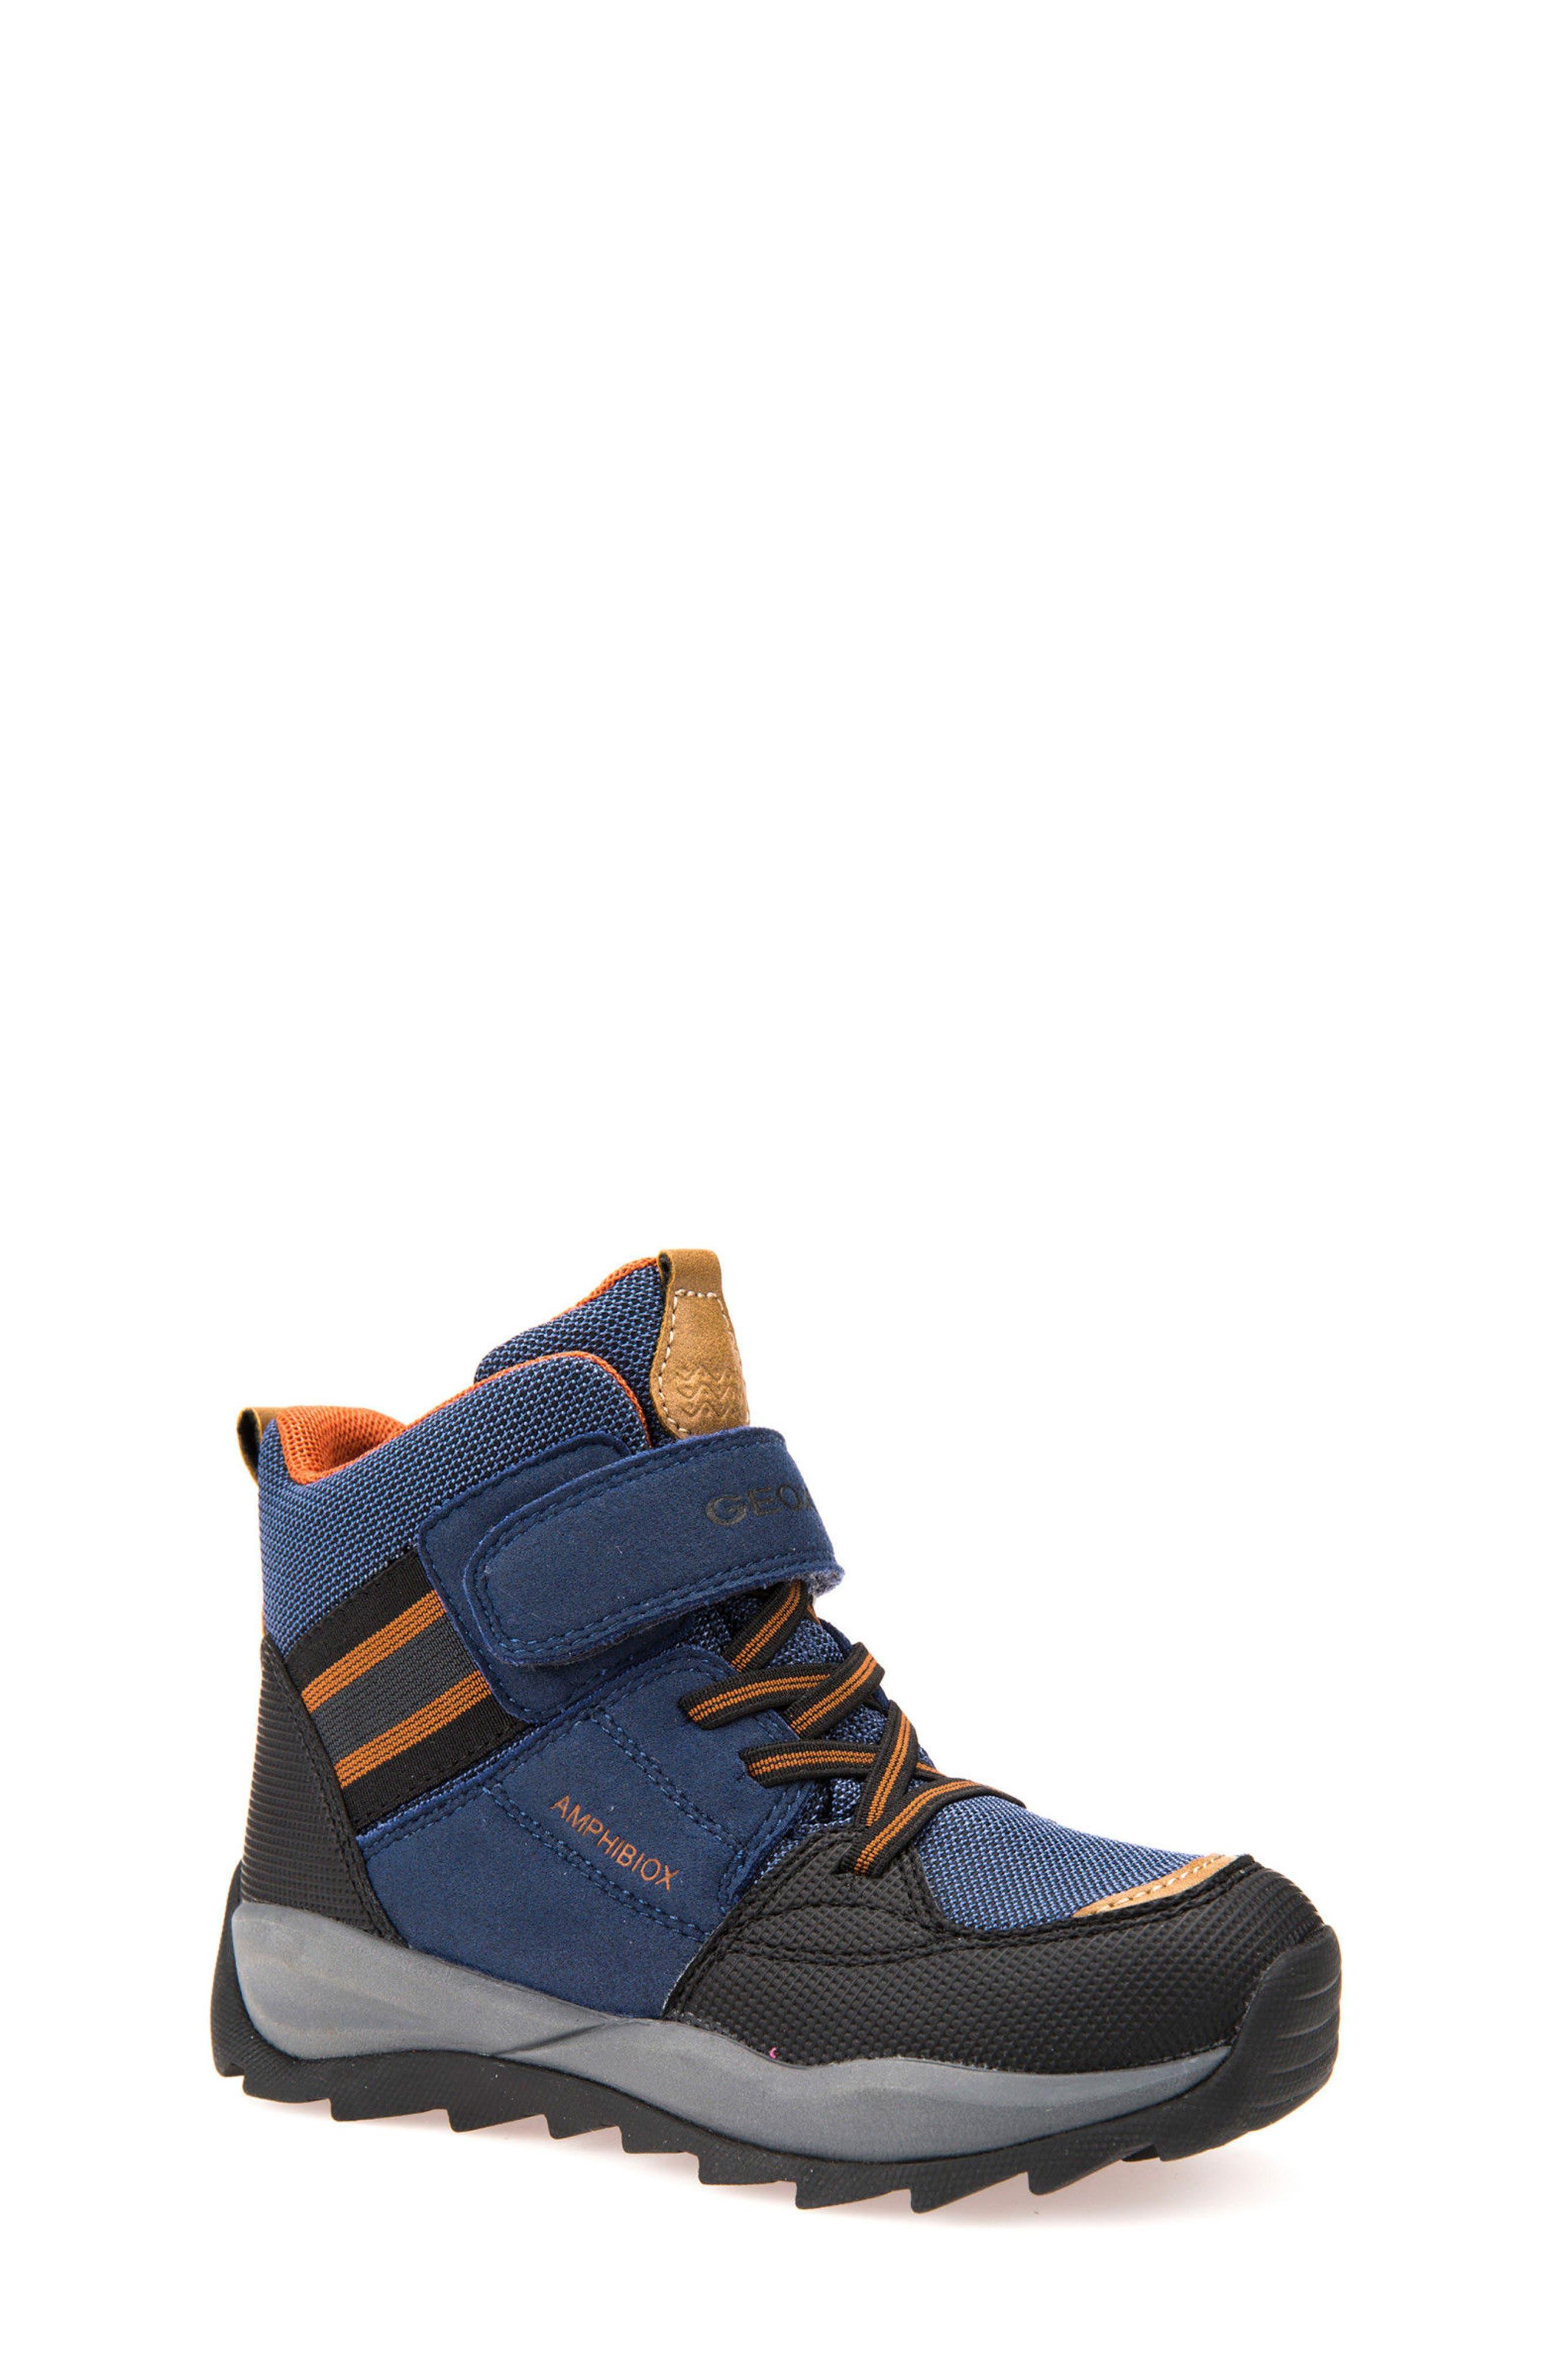 GEOX Orizont ABX Waterproof Boot, Main, color, 402